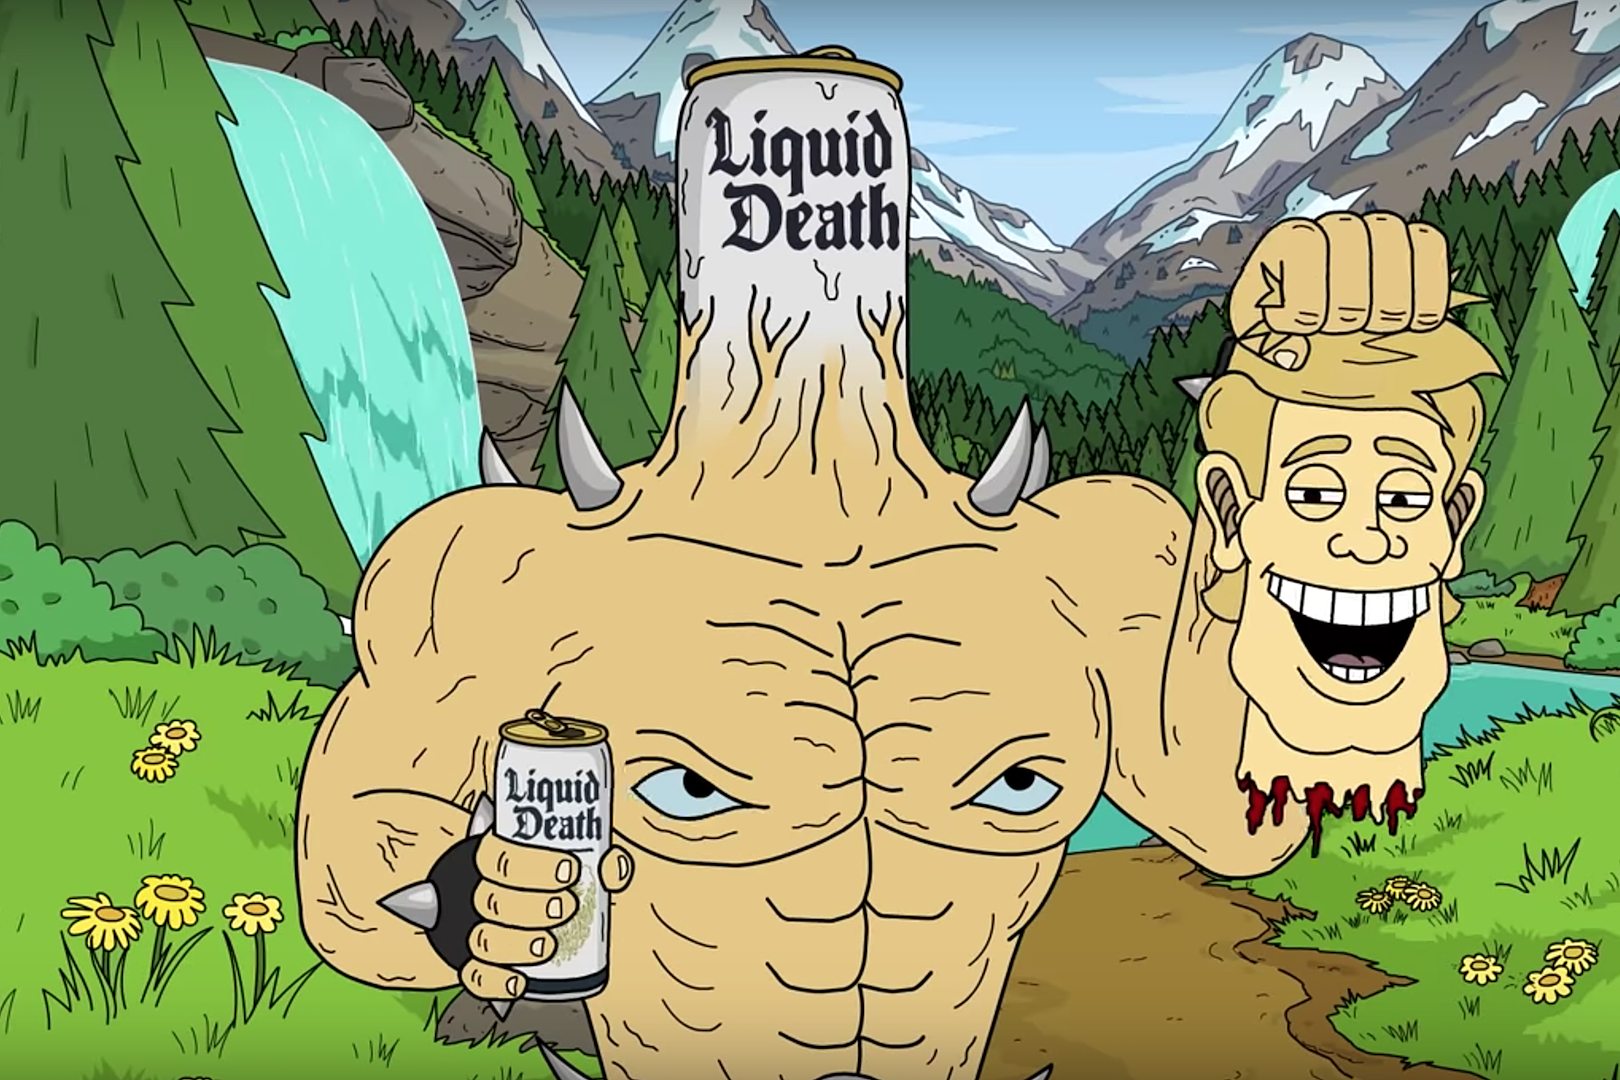 Liquid Death's 'Punk Rock' Water in a Can Raises $2 25 Million